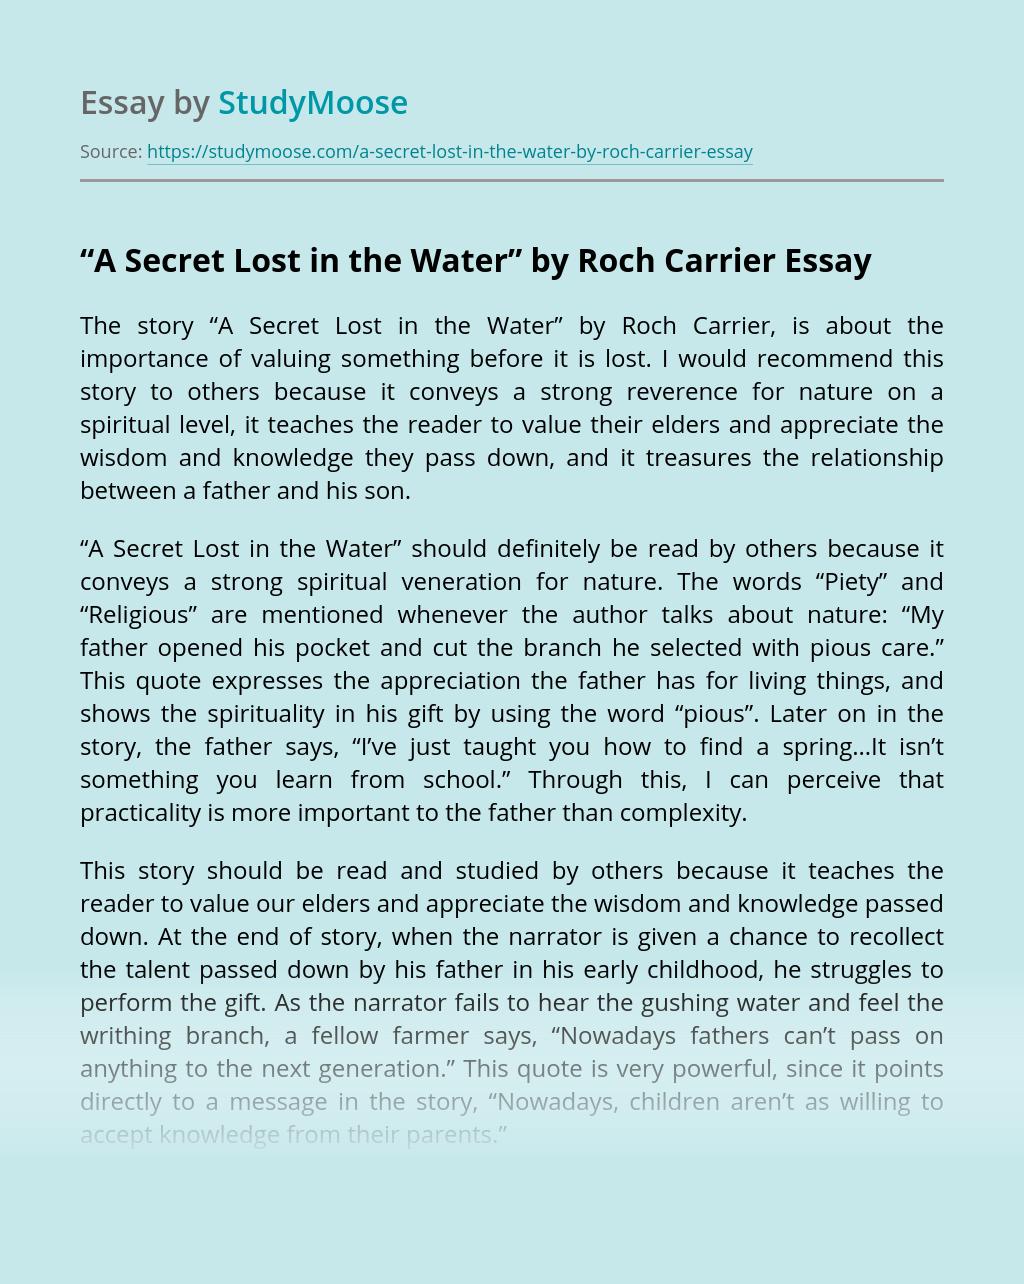 """A Secret Lost in the Water"" by Roch Carrier"